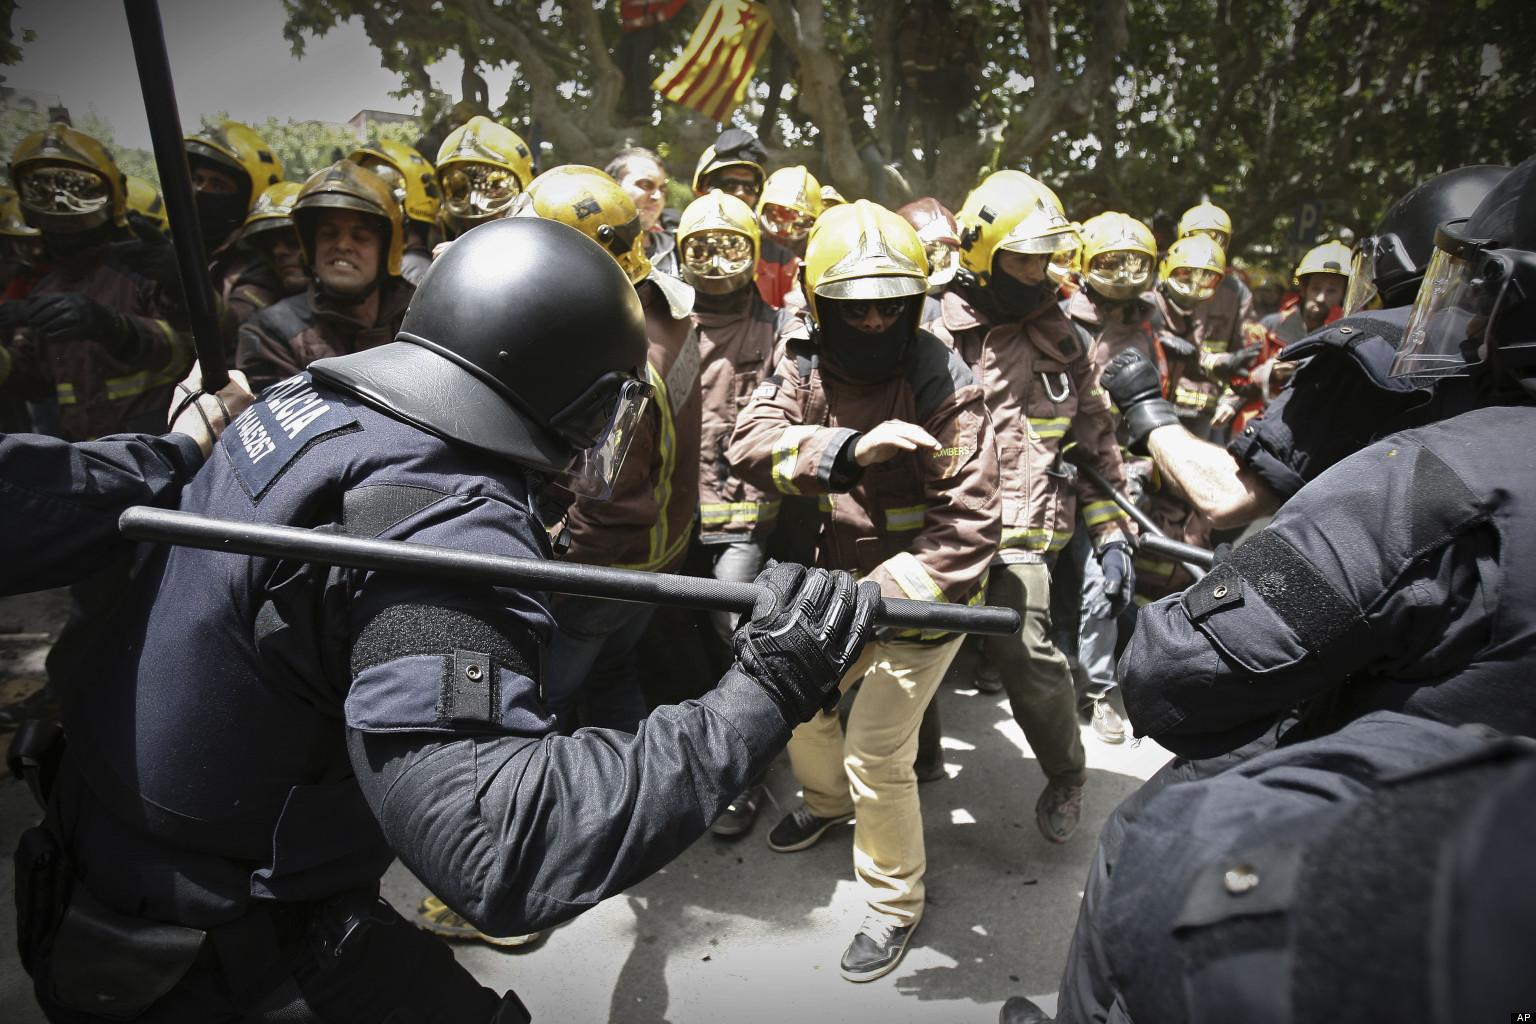 Firefighter cop jokes